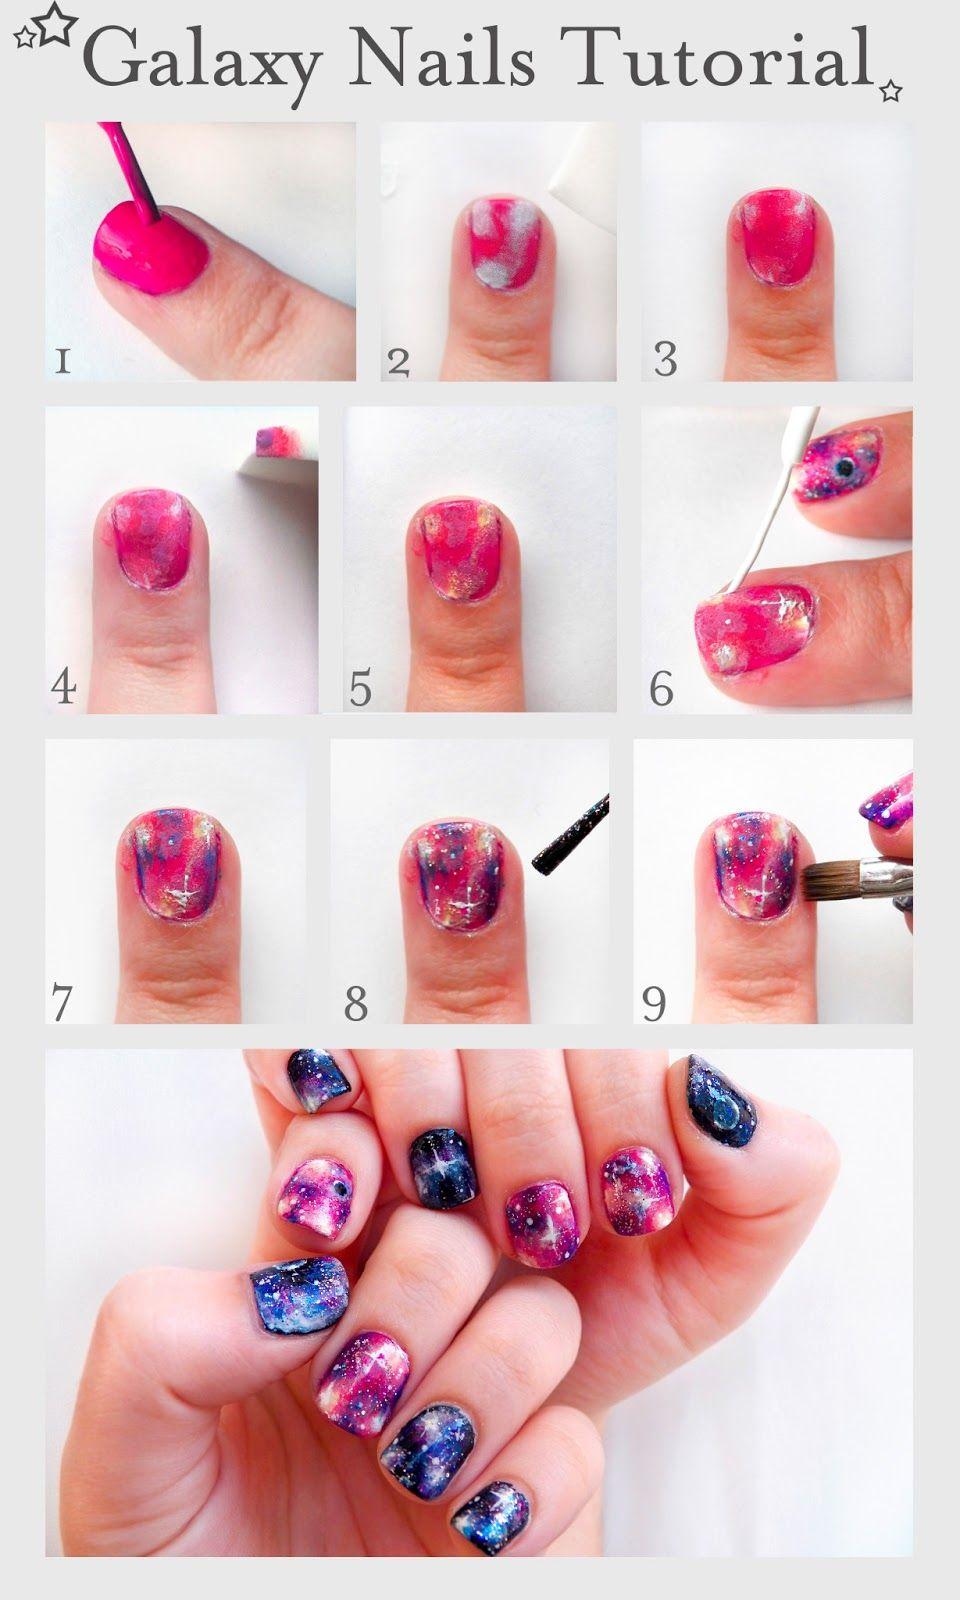 Nail Art Ideas nail art tricks : Pretty (Squared) galaxy nails tutorial nail art tutorial | Pretty ...